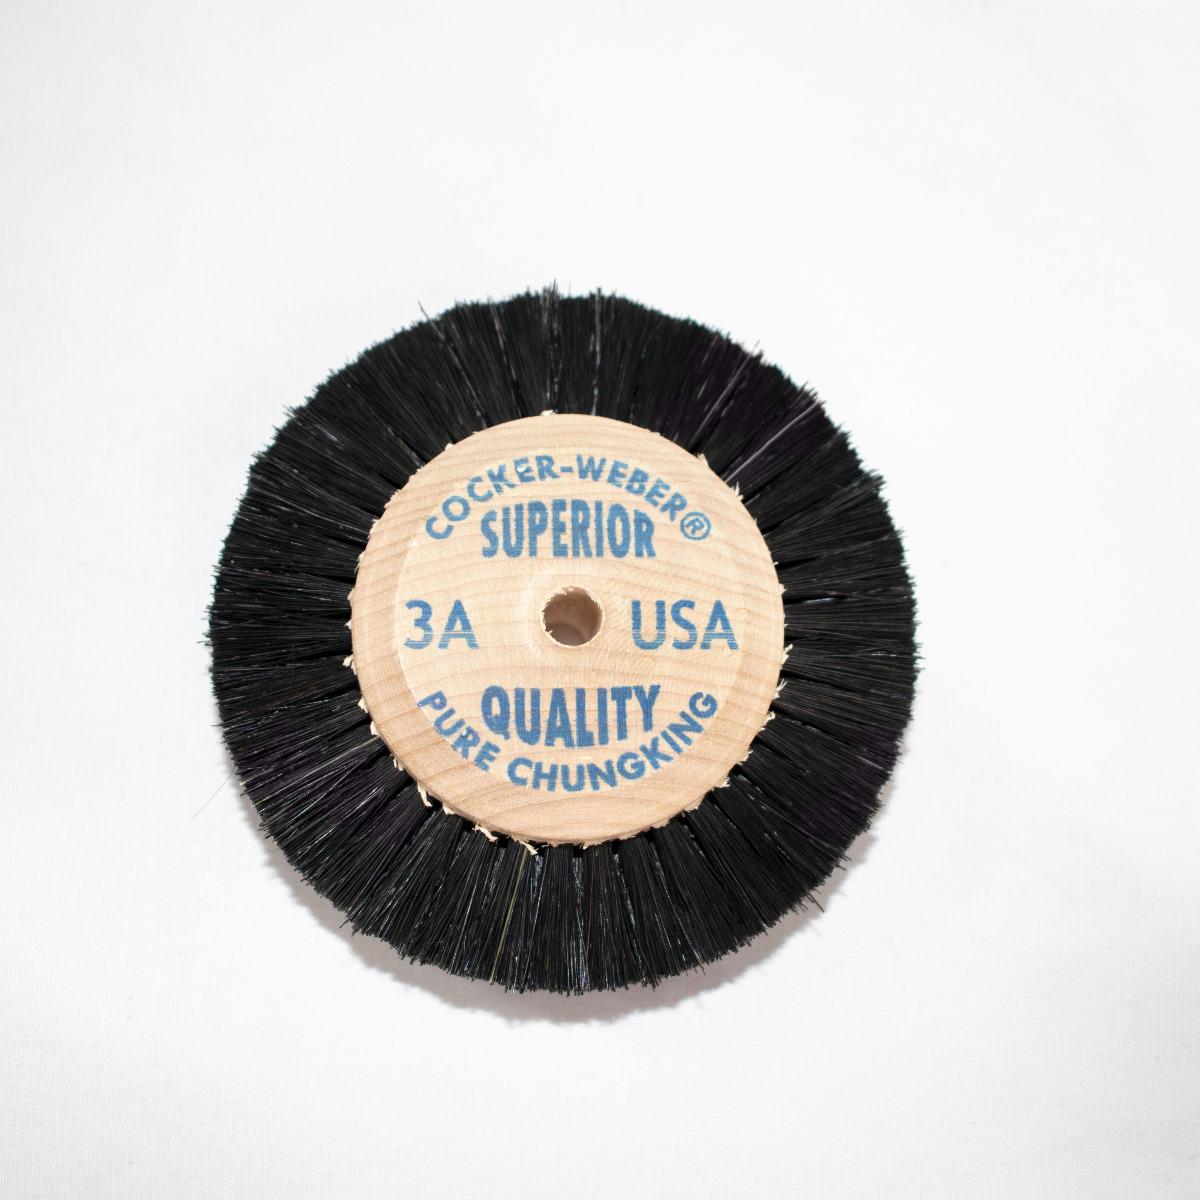 "3-A Blue Label Cocker Weber Brushes, 5/8"" Trim Hair"